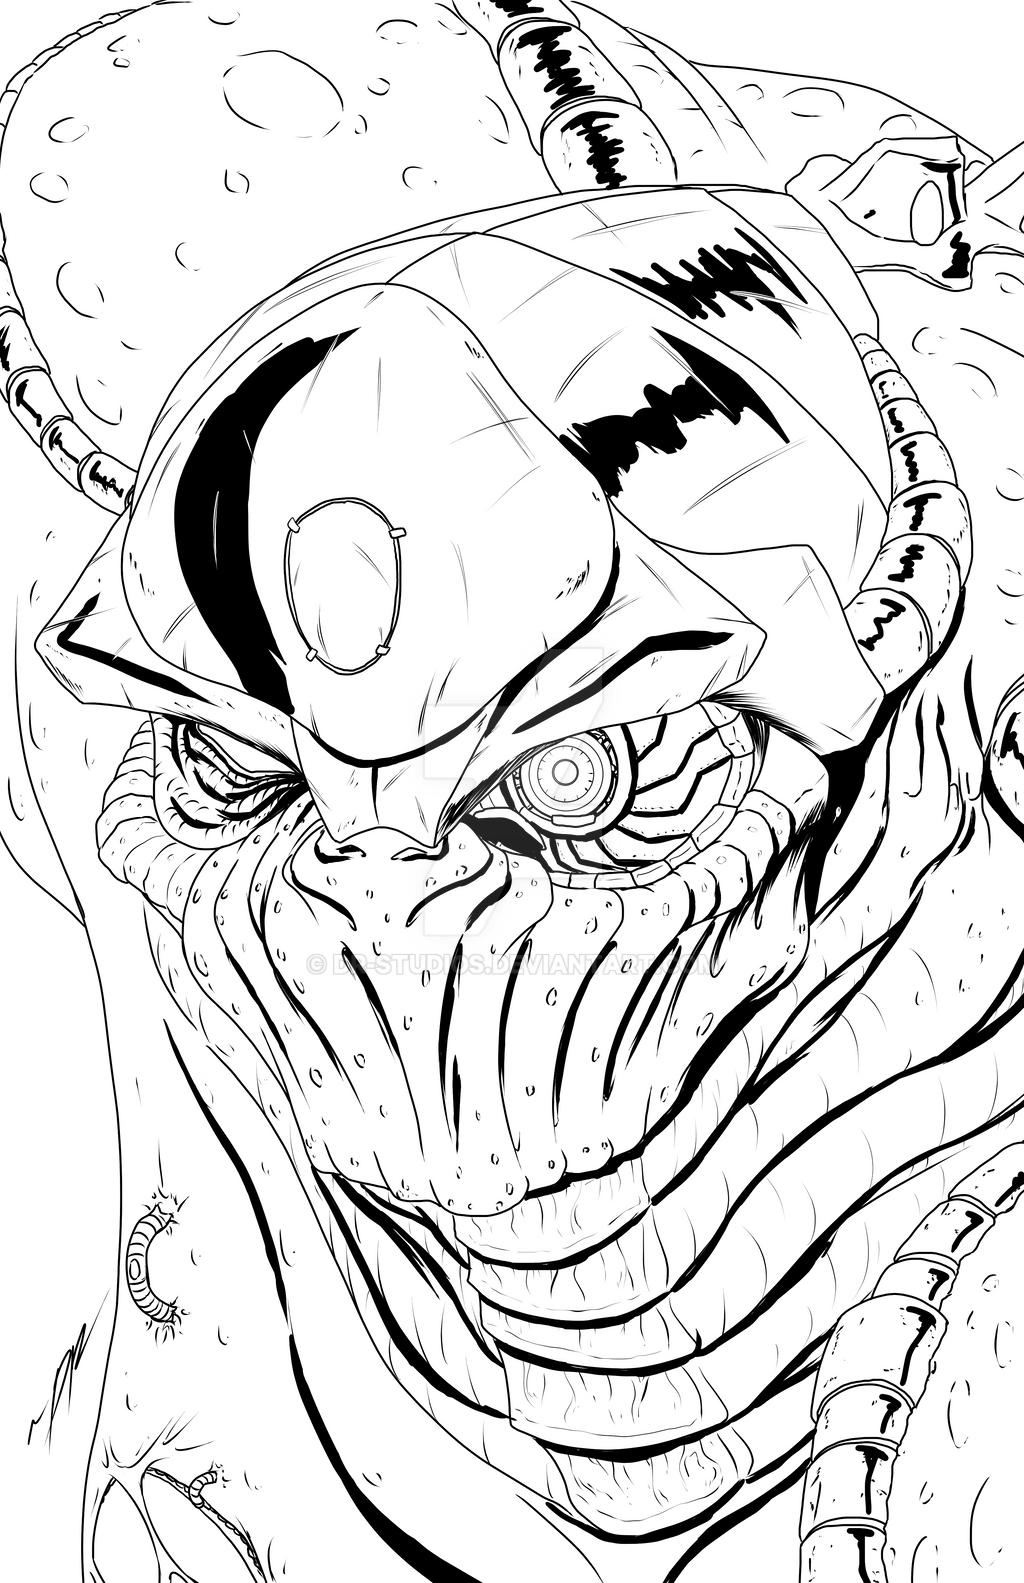 COM - Exterminus by DR-Studios